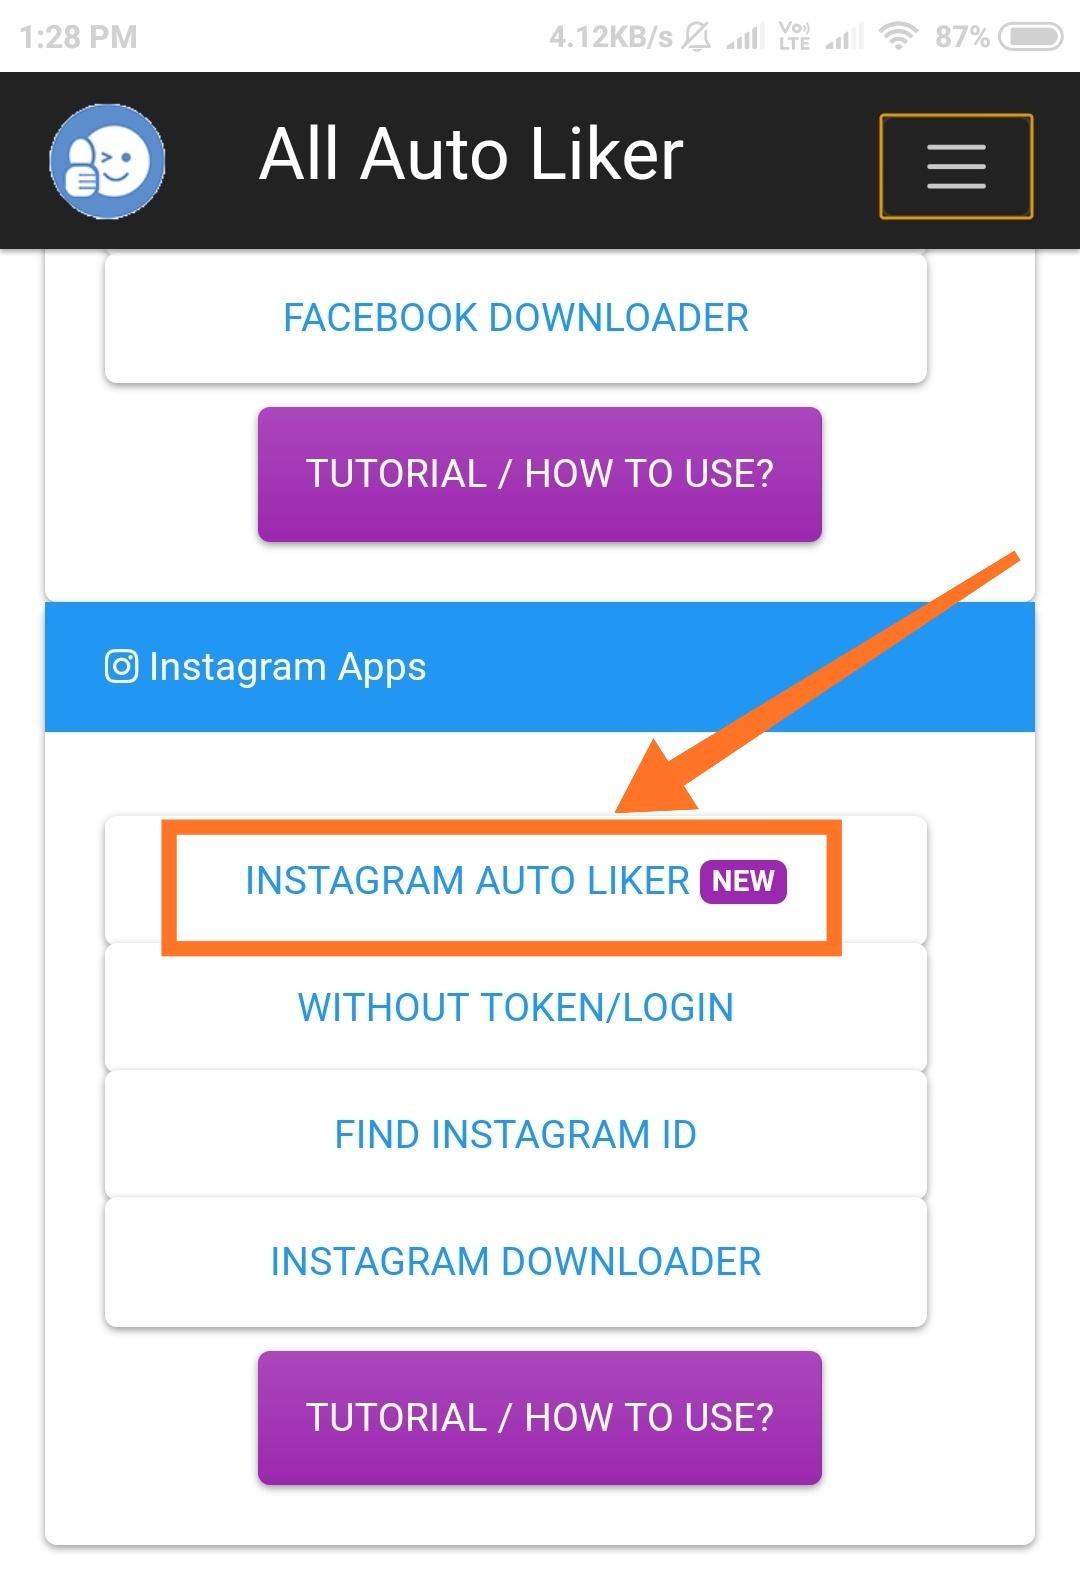 Instagram Auto Liker App - 167 86 90 163